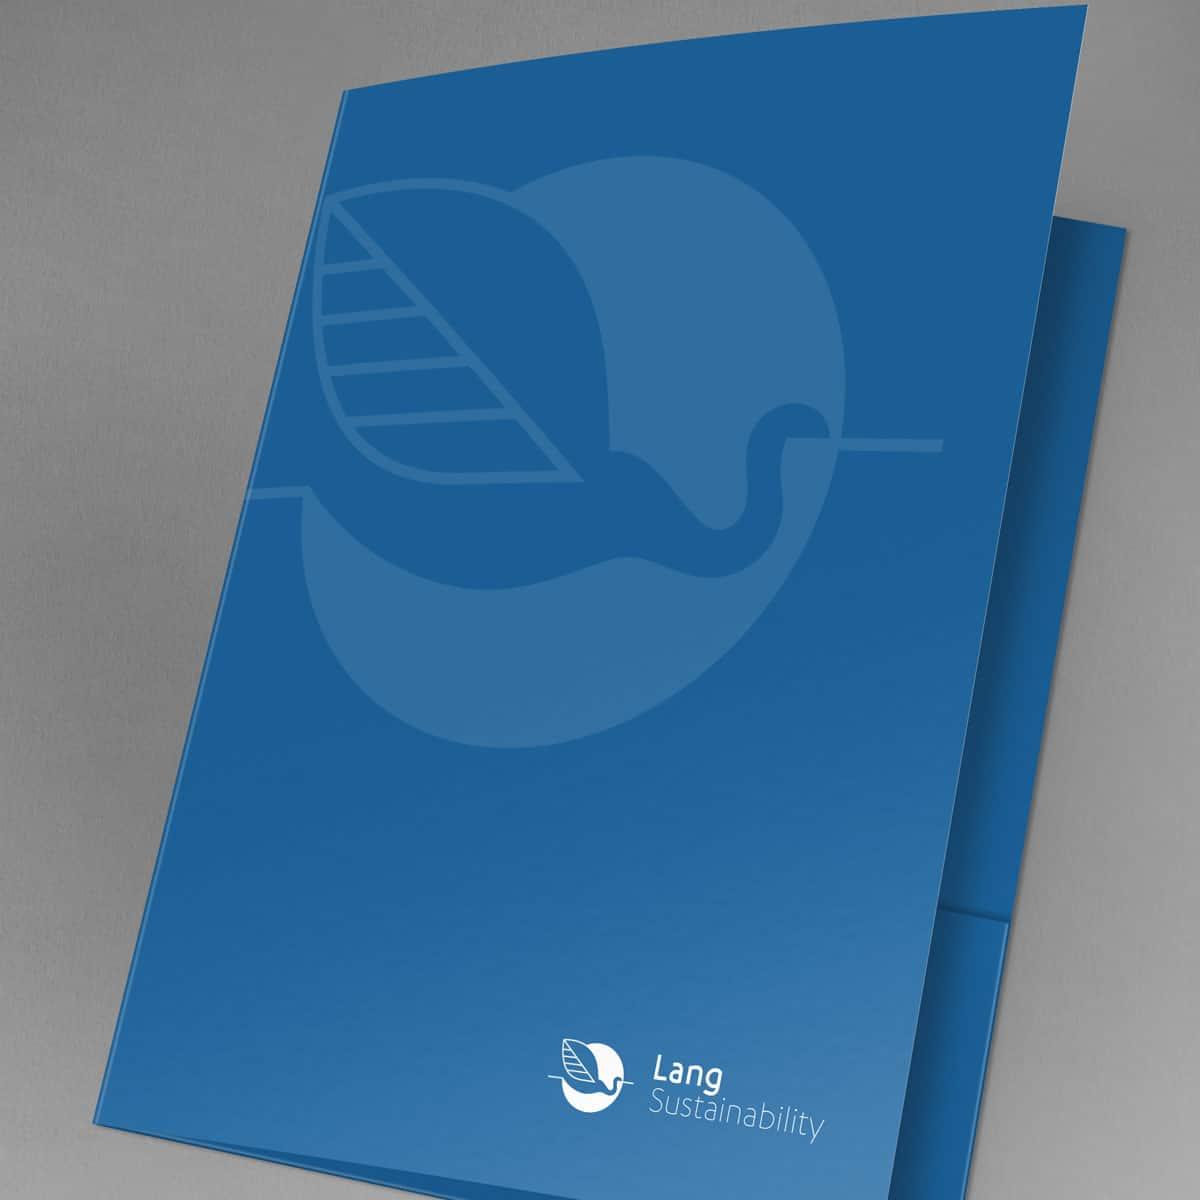 jfm-creatives-lang-sustainability-presentation-folder